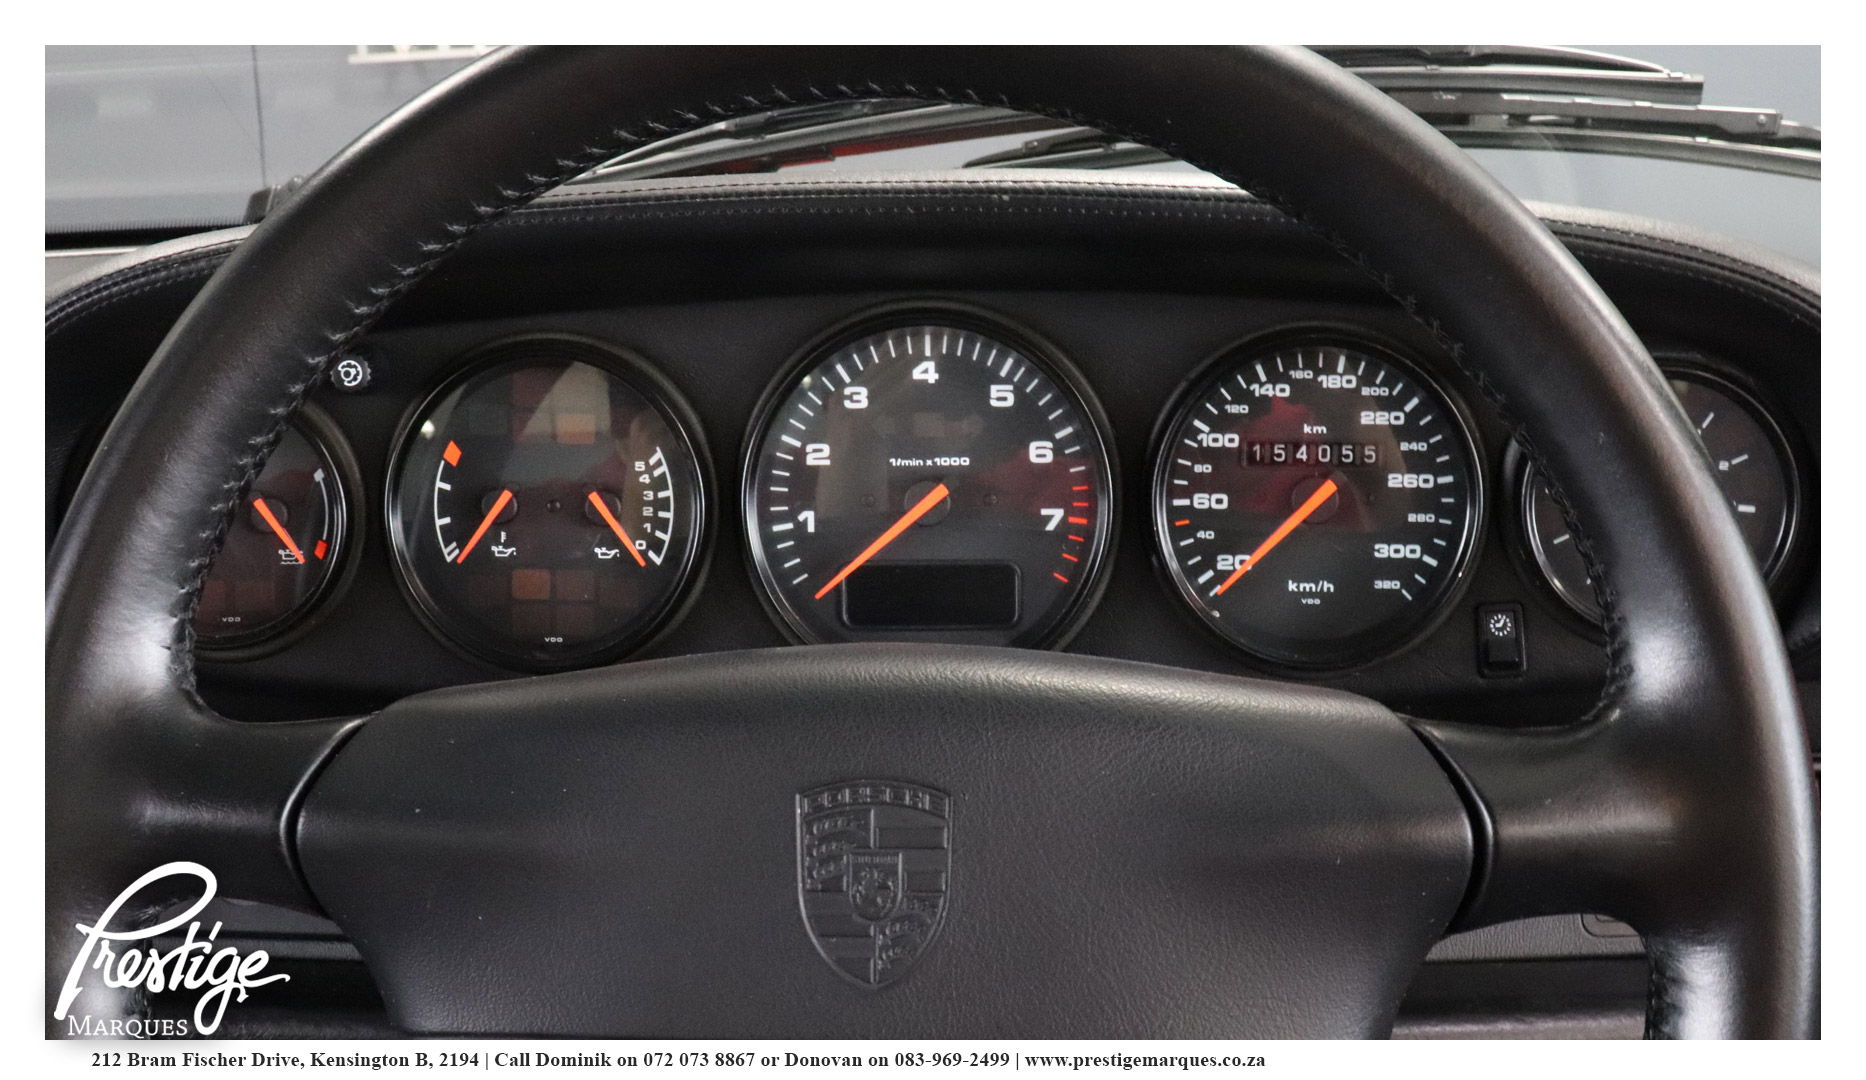 Porsche-911-993-Turbo-Prestige-Marques-Randburg-Sandton-15